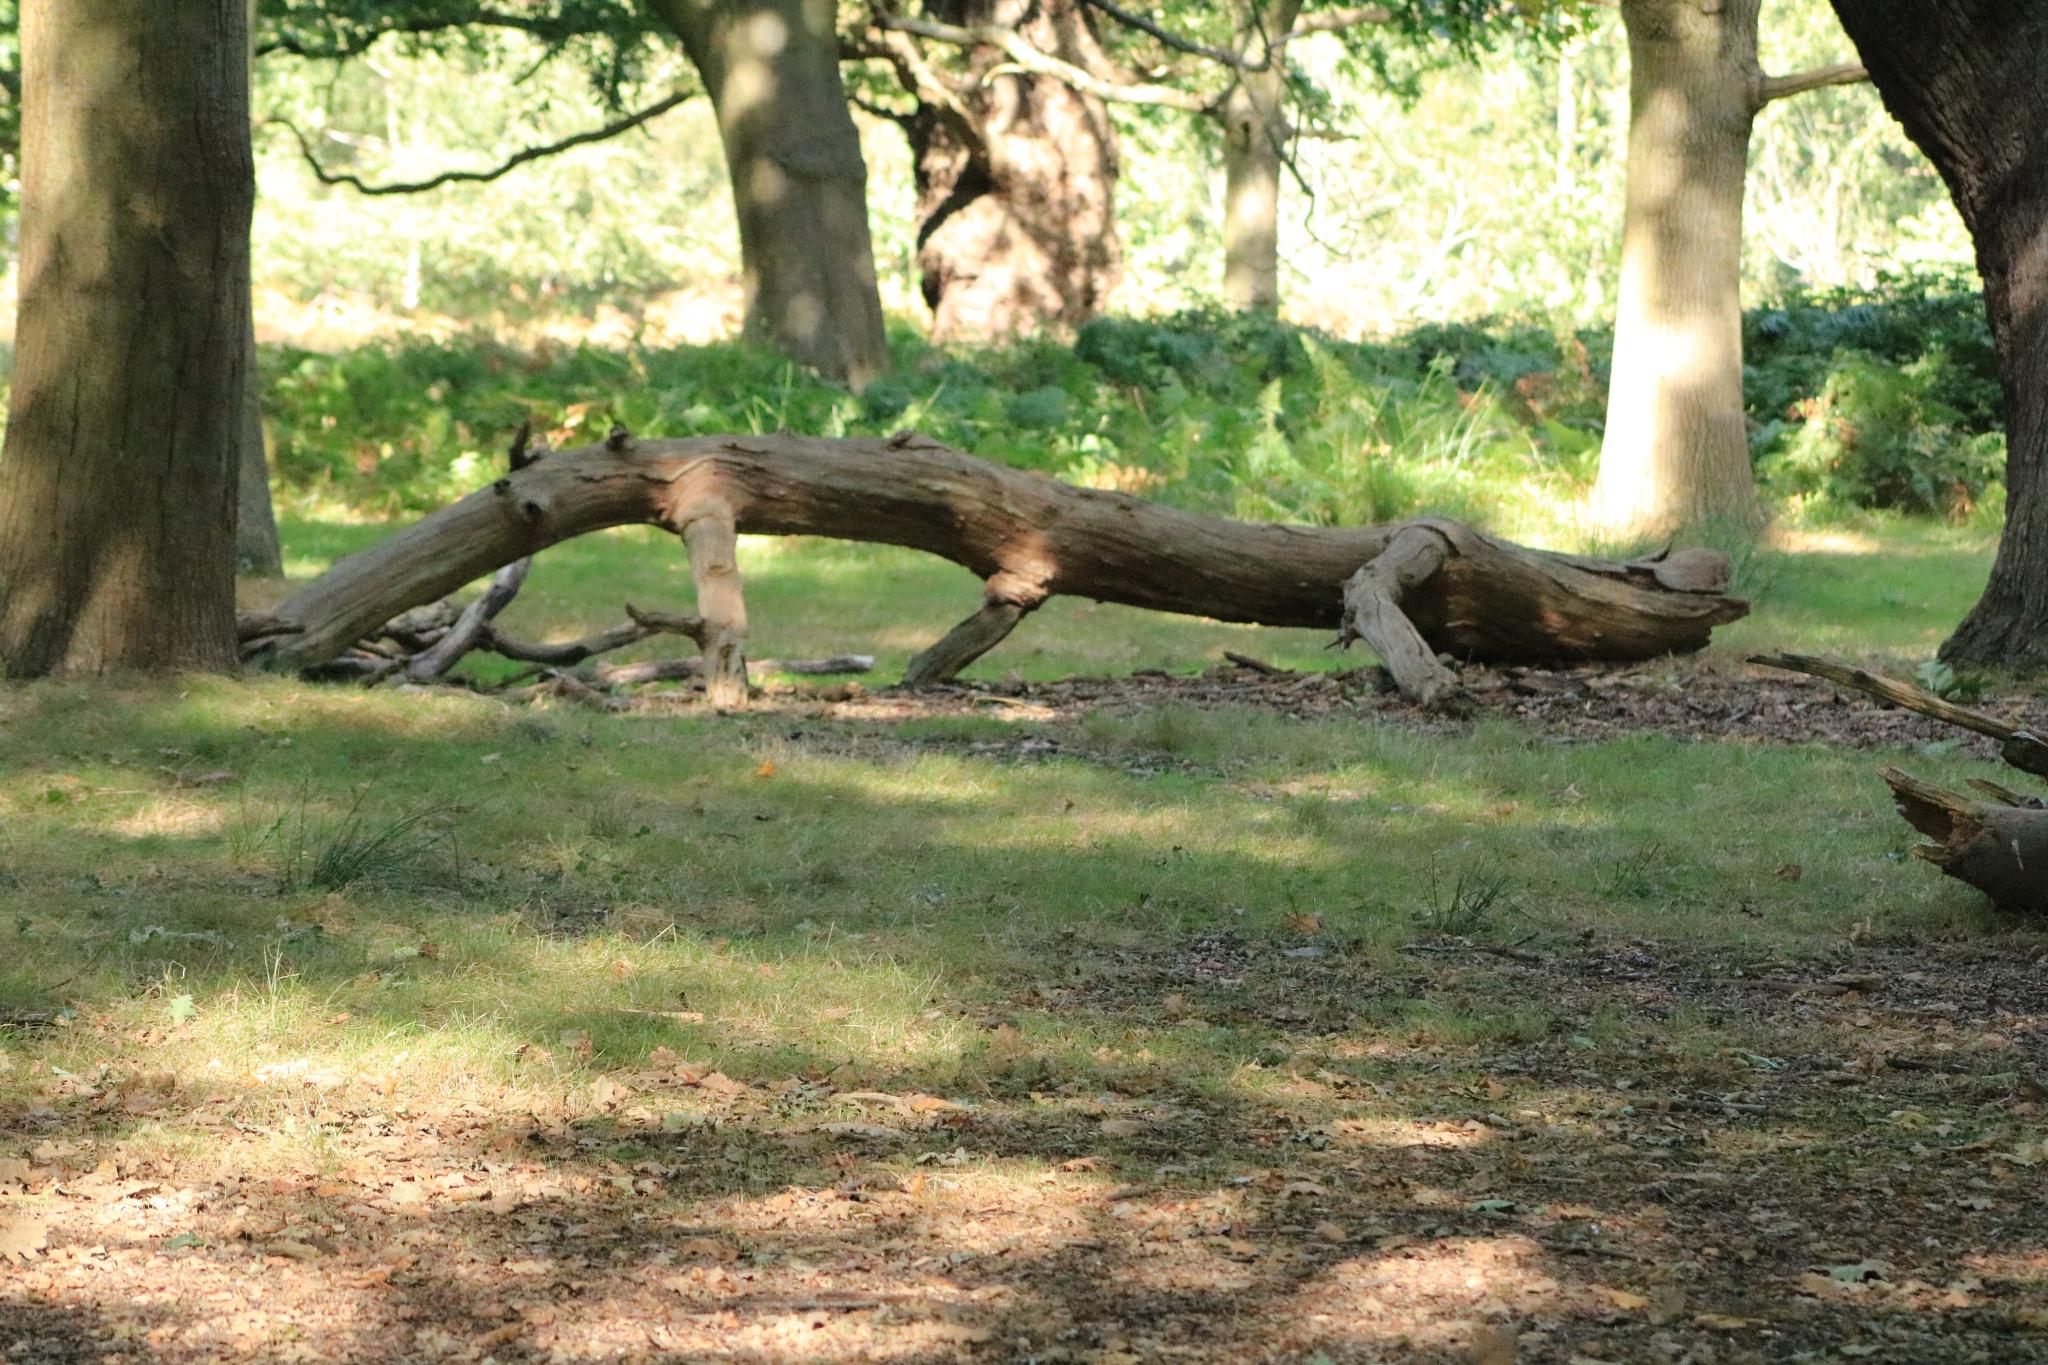 A lizard or croc lookalike tree branch! by Mo Dessouki